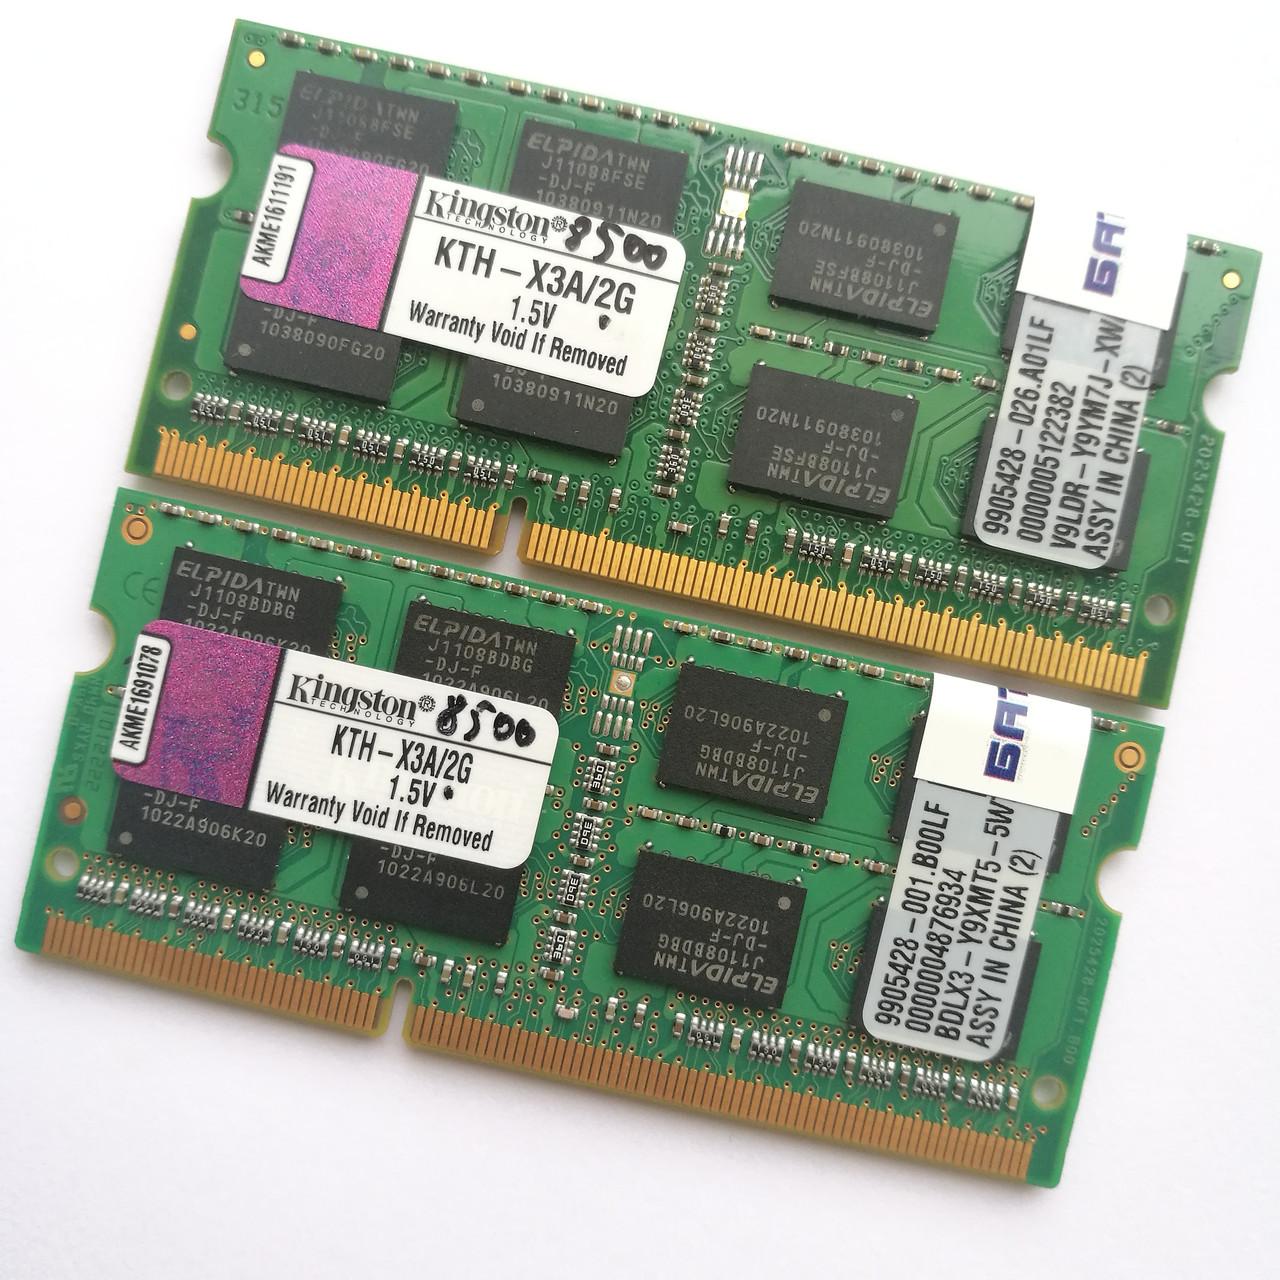 Оперативная память для ноутбука Kingston SODIMM DDR3 4Gb (2+2) 1066MHz 8500s CL7 (KTH-X3A/2G) Б/У